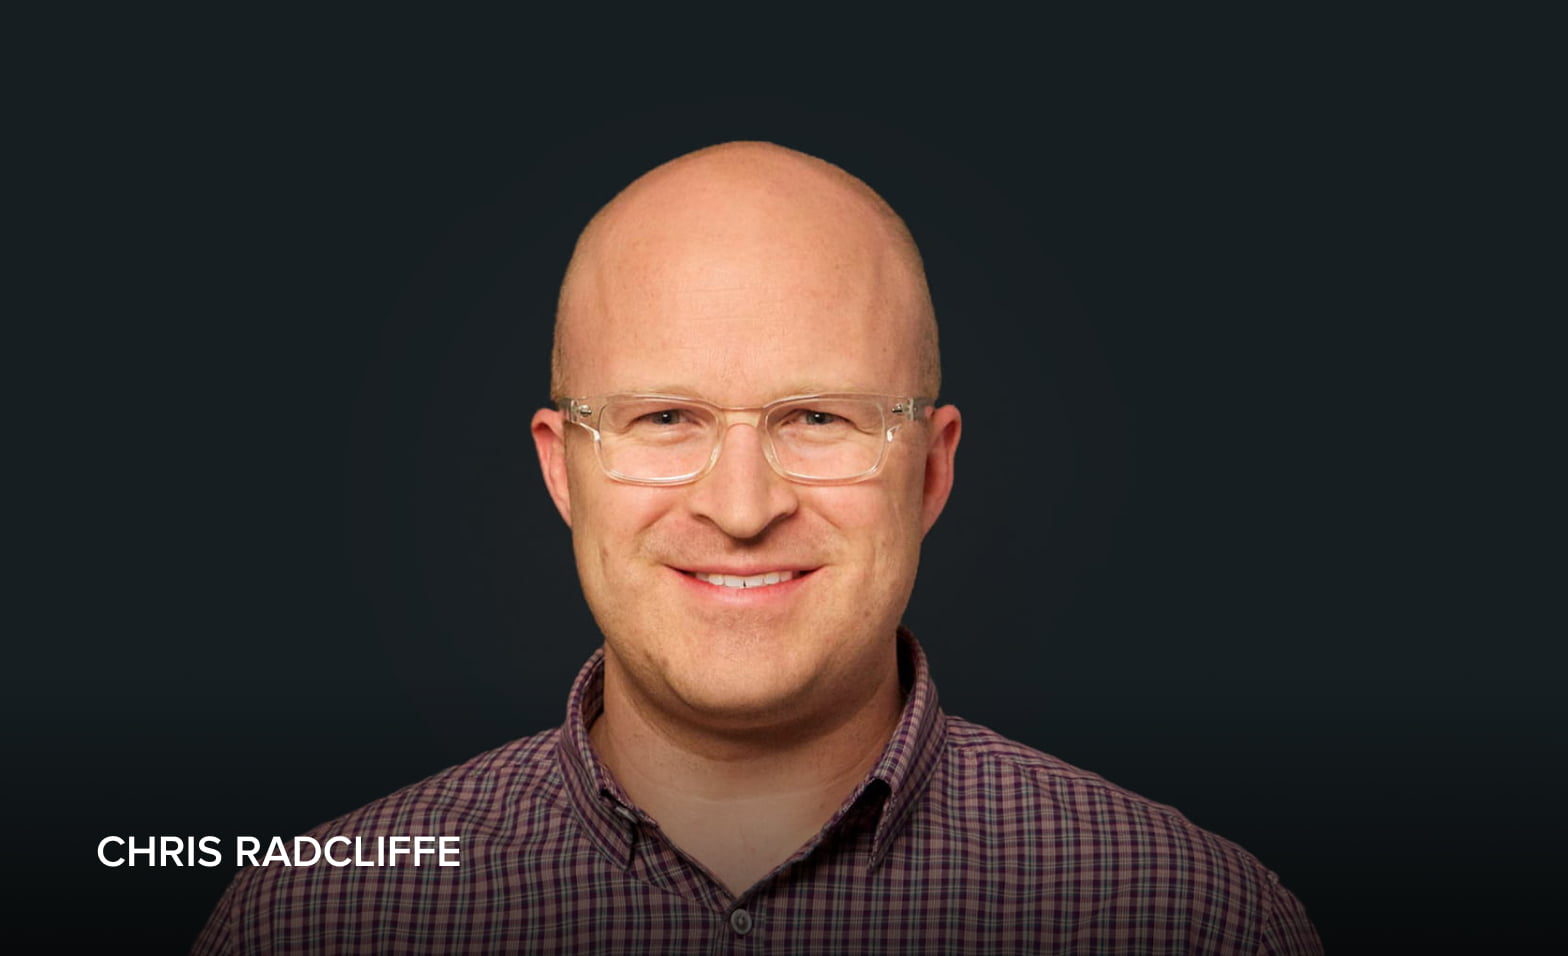 A headshot of Chris Radcliffe, Digital Workplace Advisor